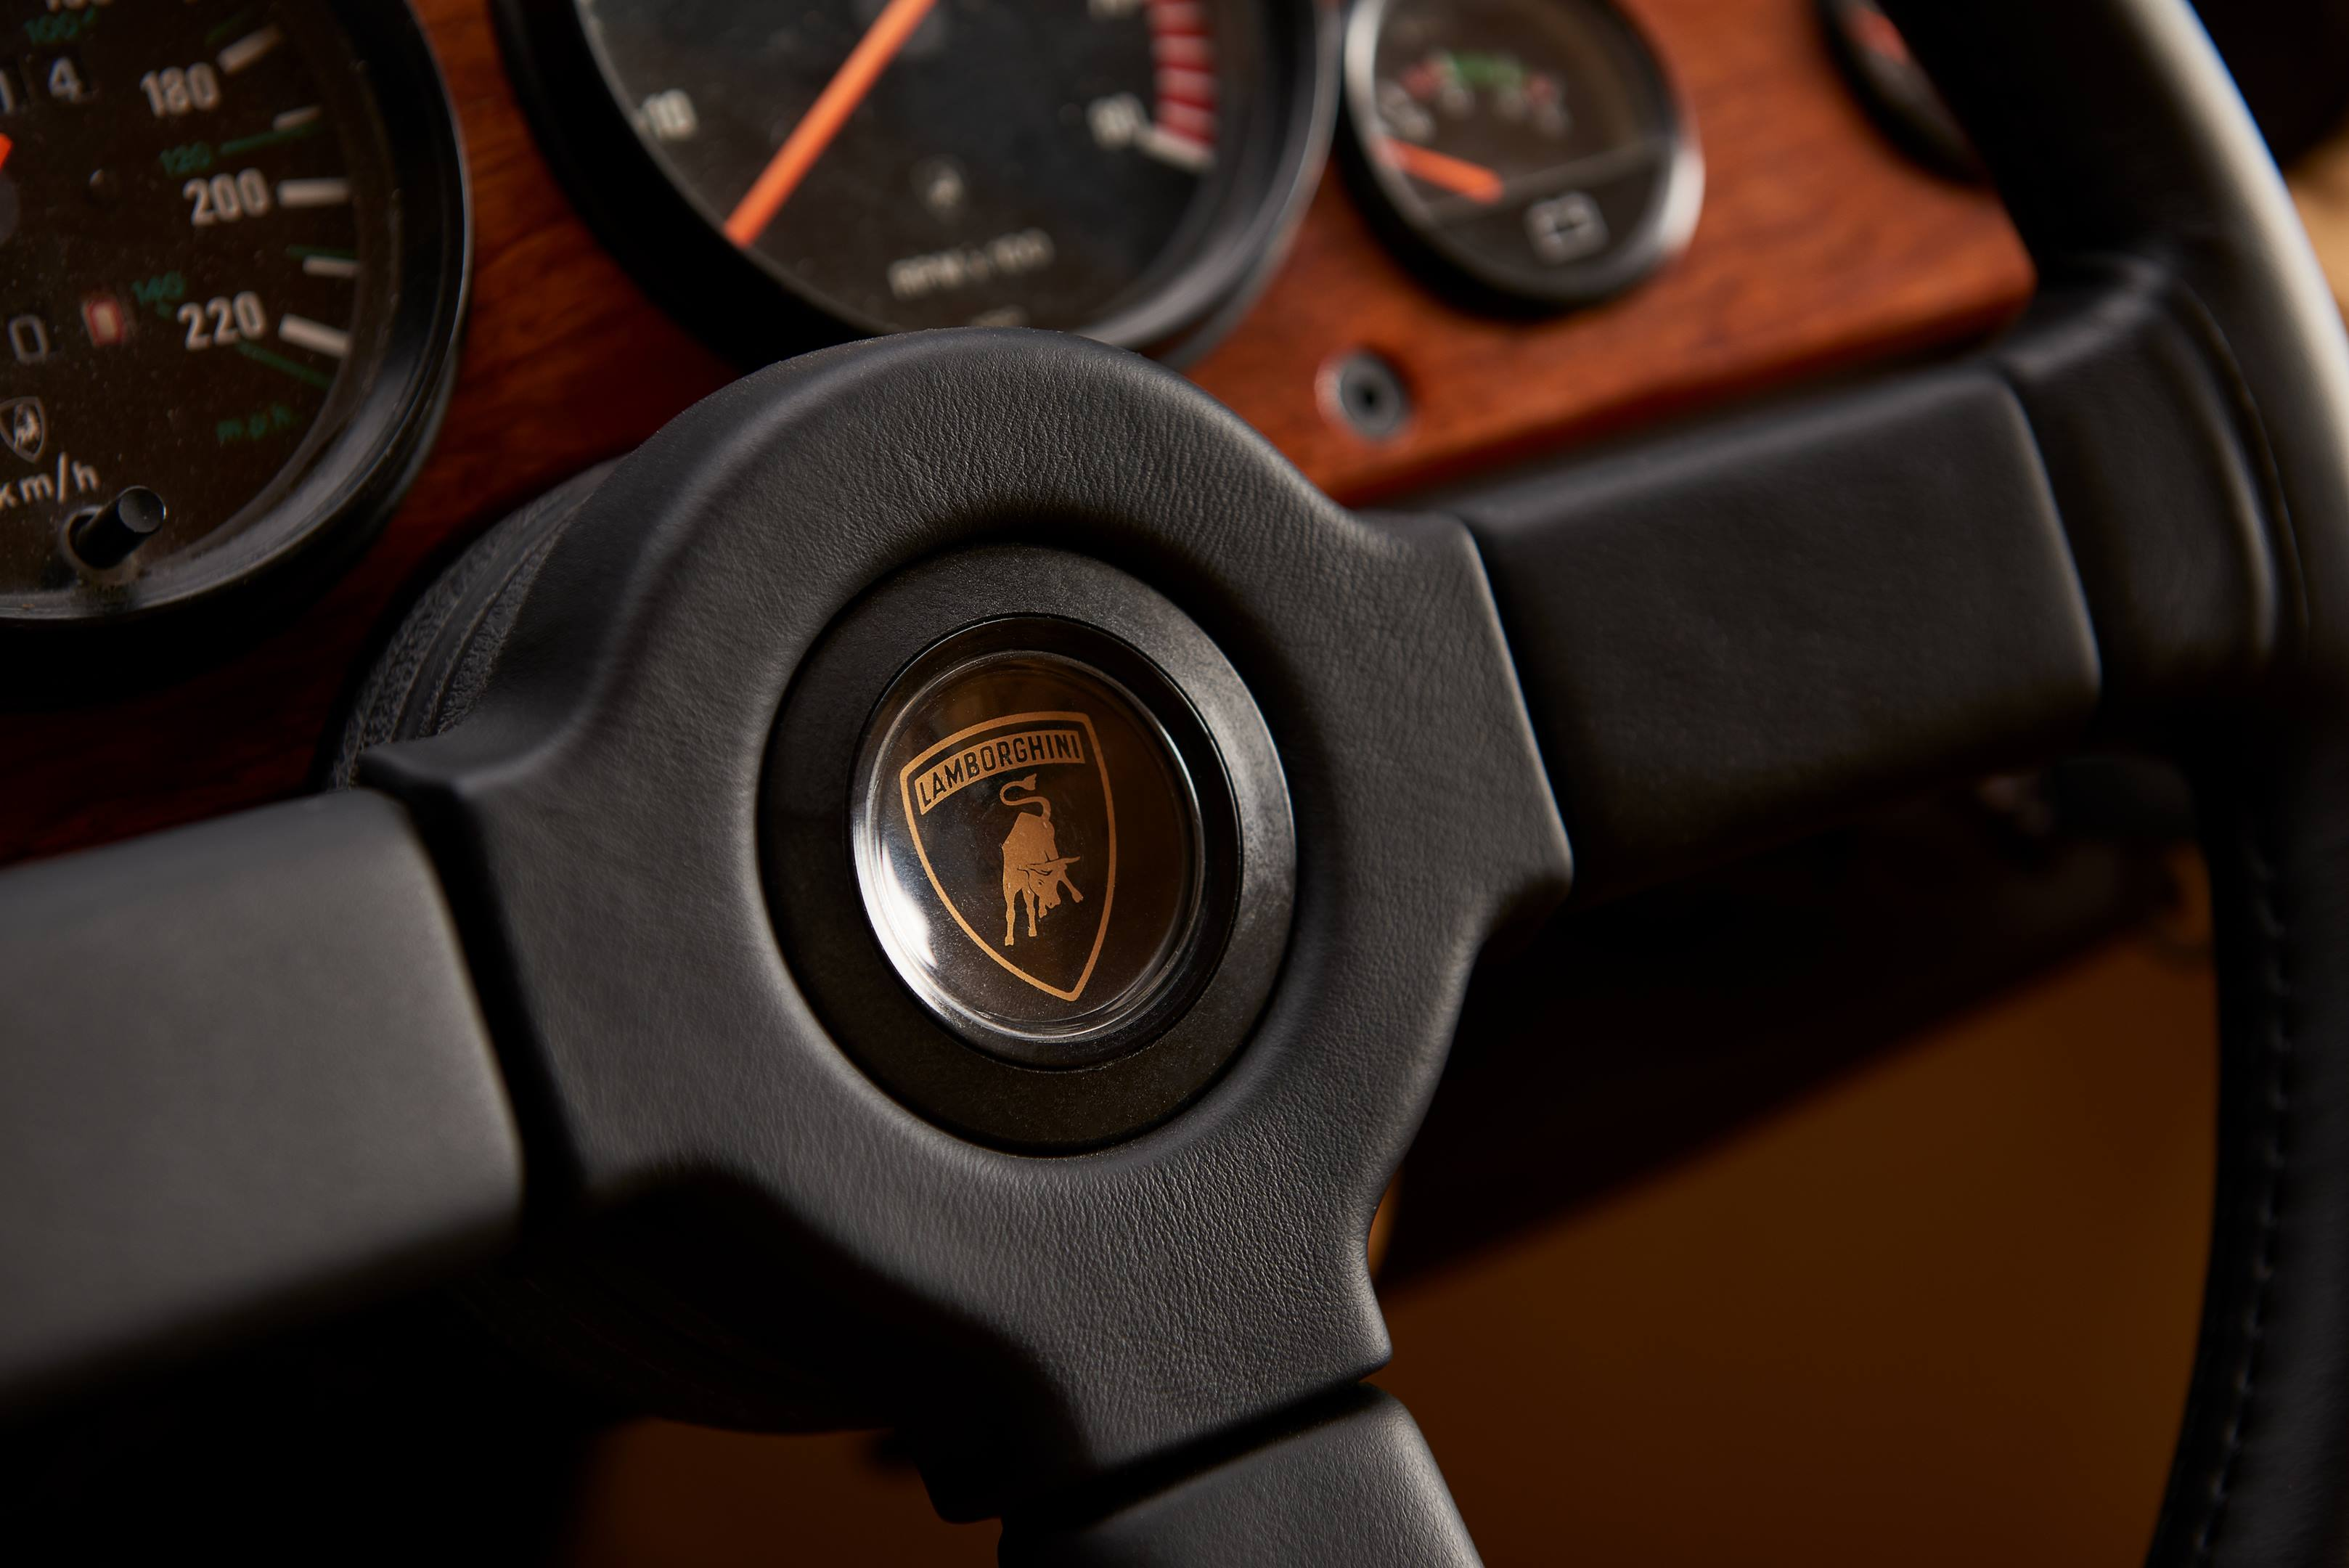 Lamborghini LM002 steering wheel